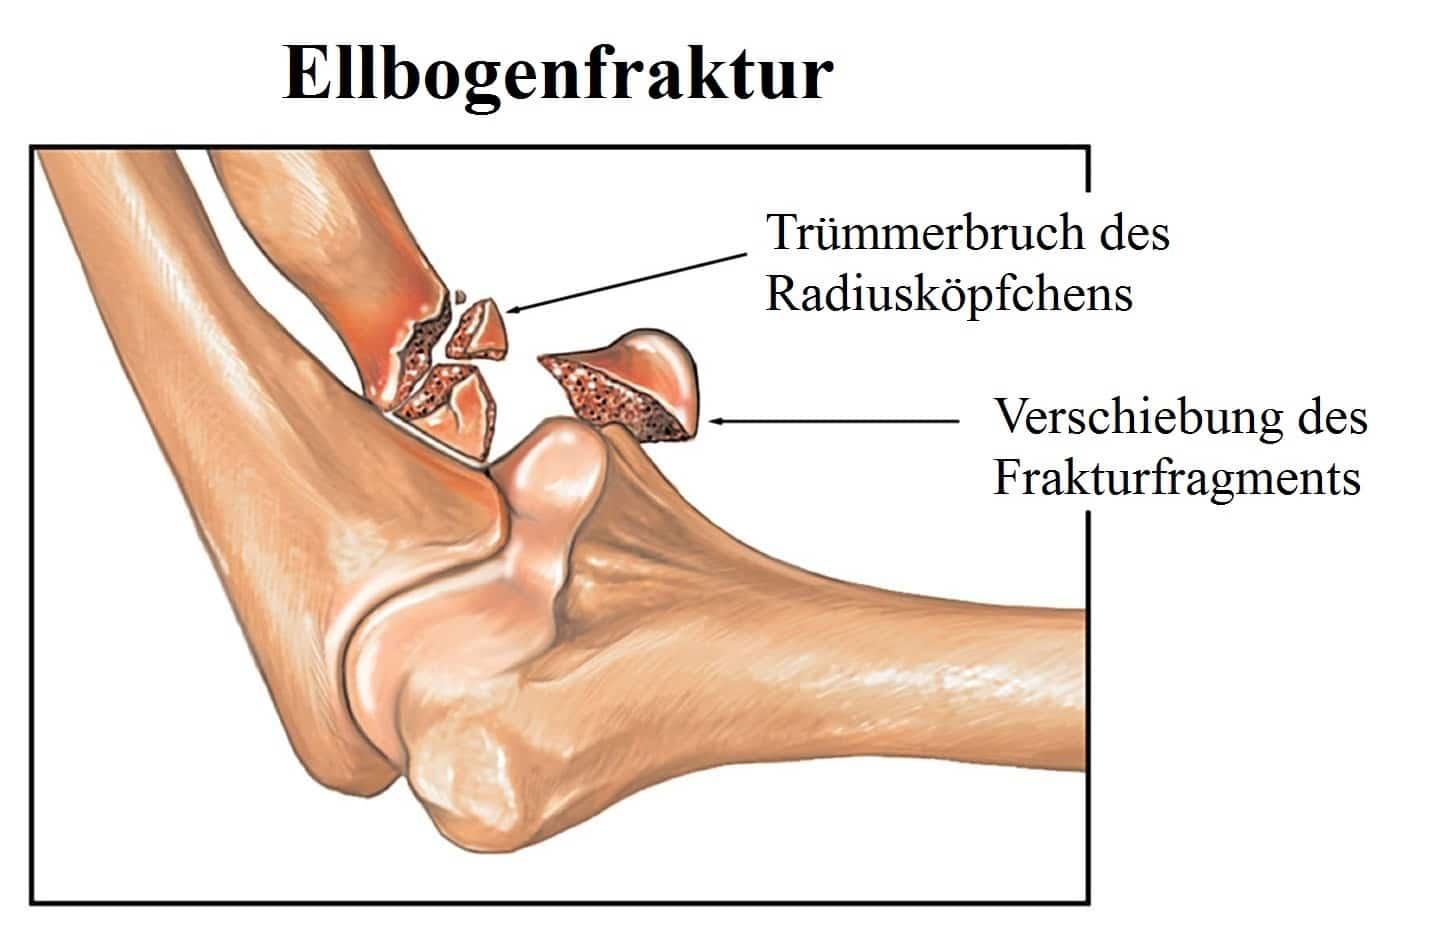 Proximale Radiusfraktur, Physiotherapie, Kind, distal, Behandlung ...